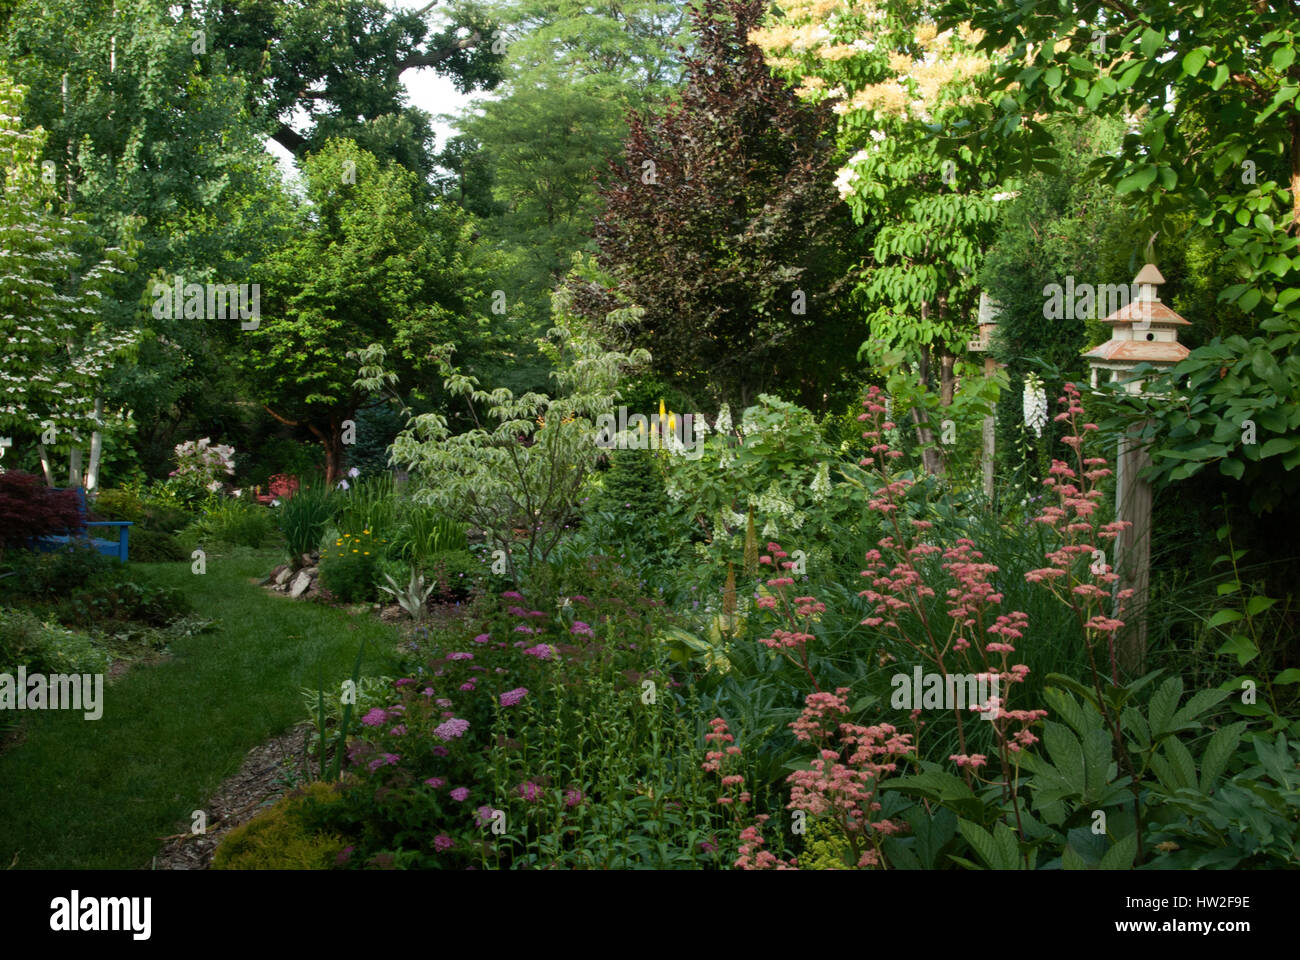 Summer Garden with Birdhouses, Rodgersia  if foreground, Variegate Dogwood Cherokee Daybreak, Rohanni Beech - Stock Image